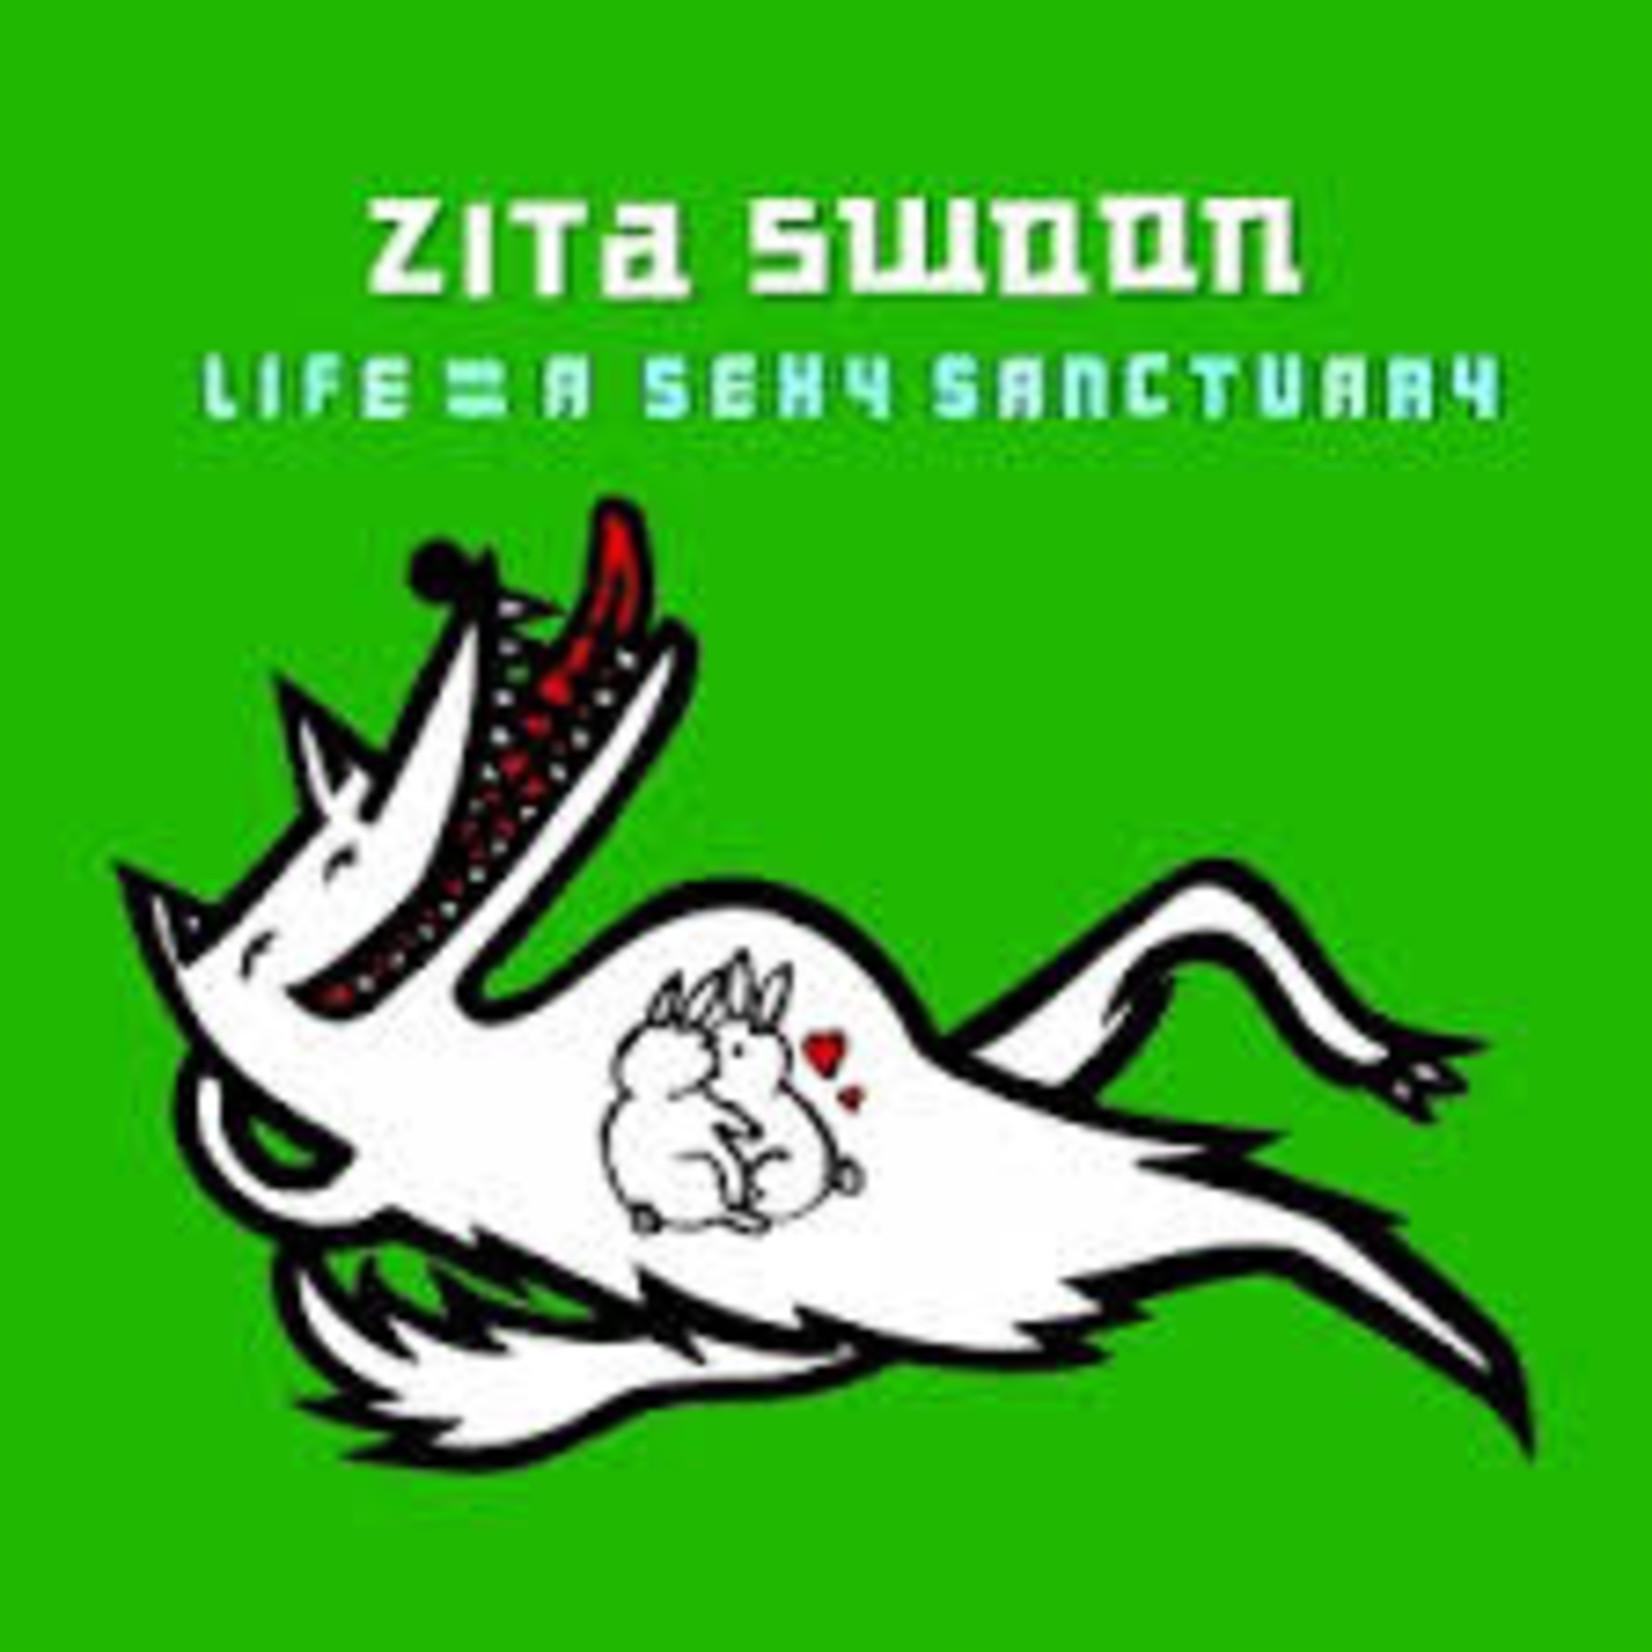 Zita Swoon - Life = A Sexy Sanctuary -Coloured-   (VINYL)